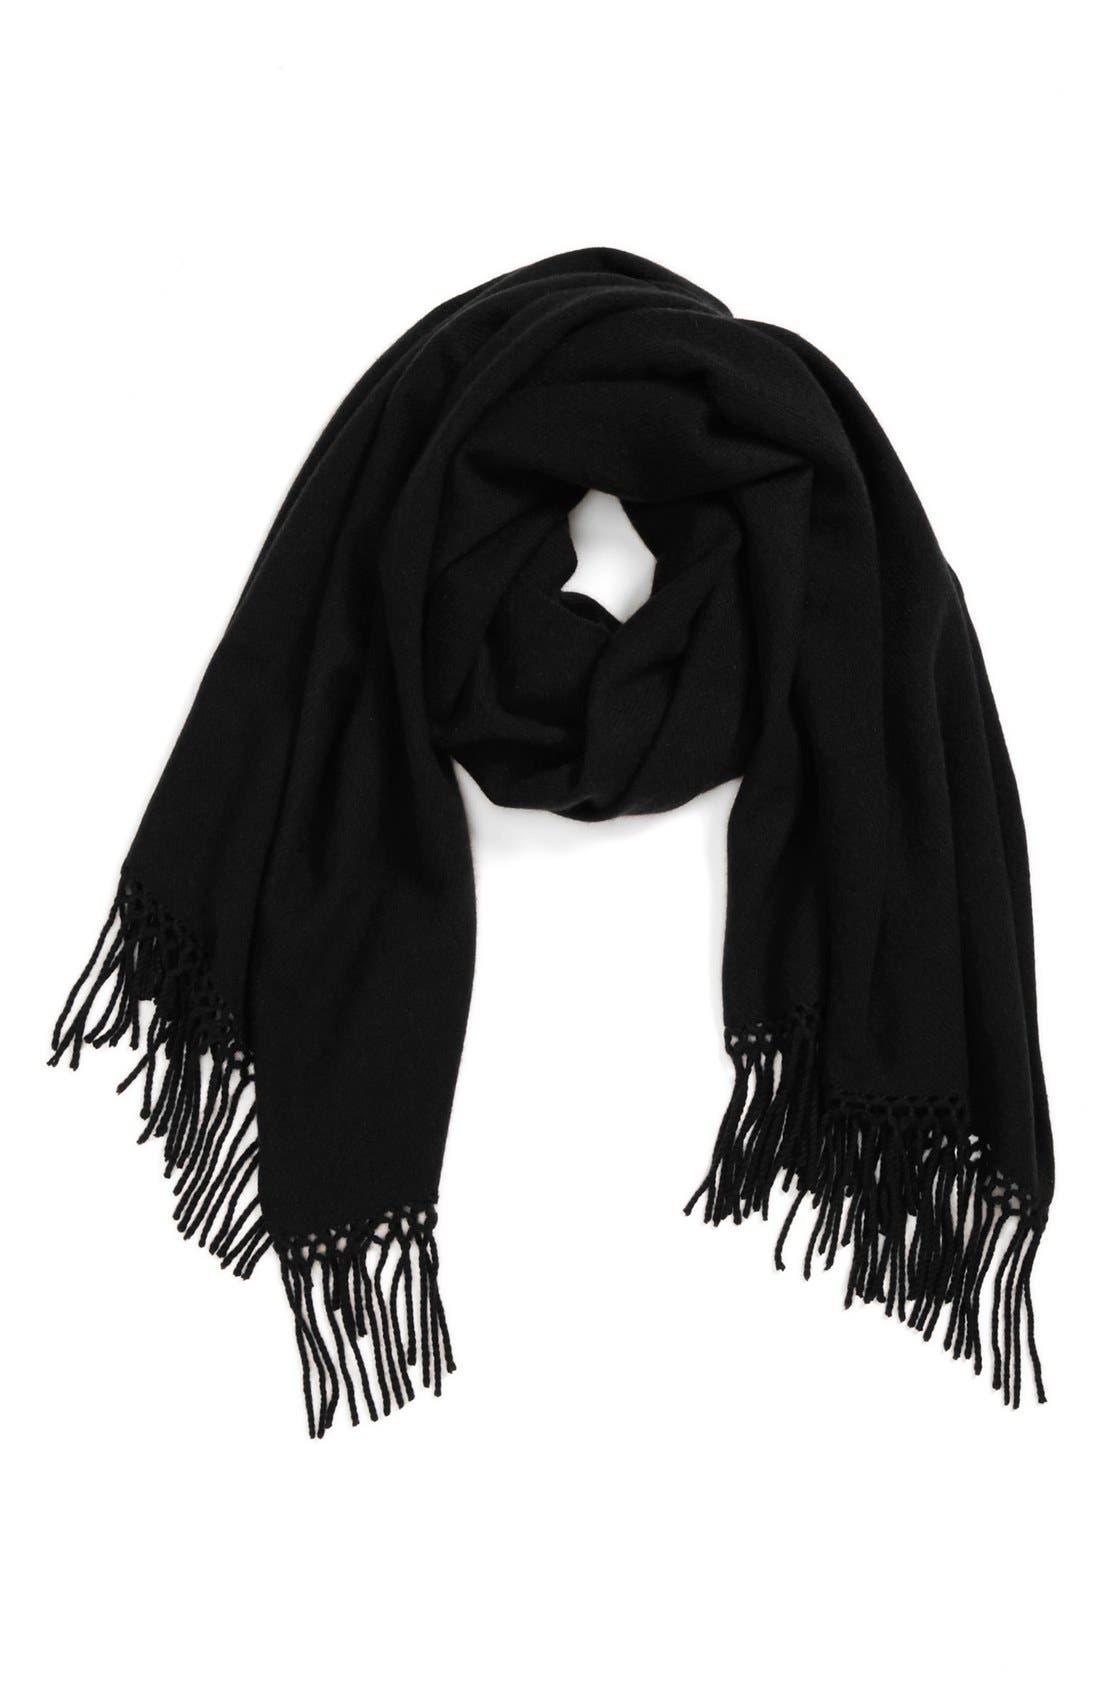 NORDSTROM Woven Cashmere Wrap, Main, color, 001